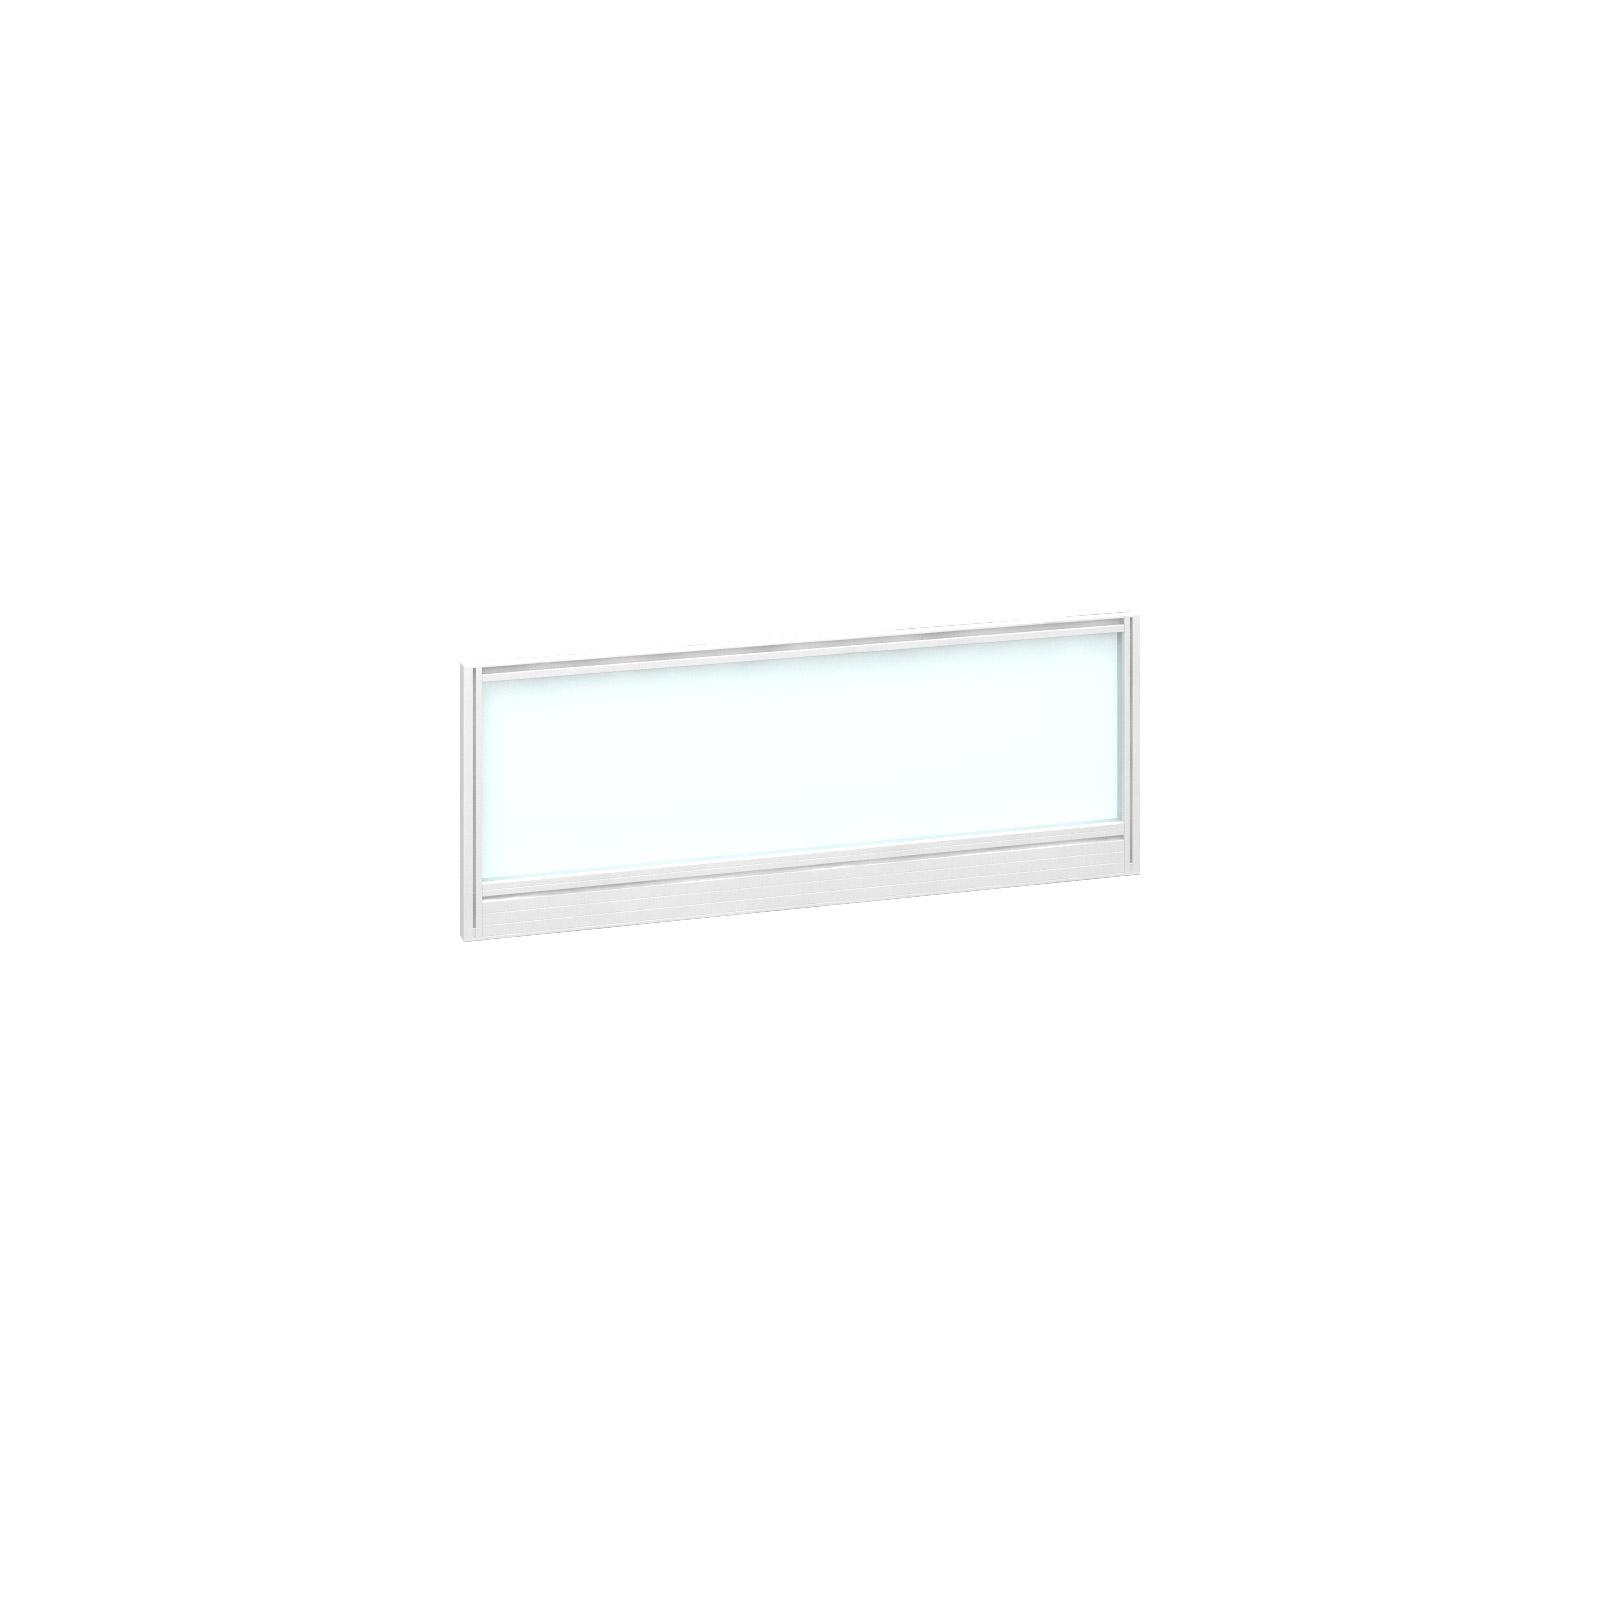 Straight glazed desktop screen 1000mm x 380mm - polar white with ...